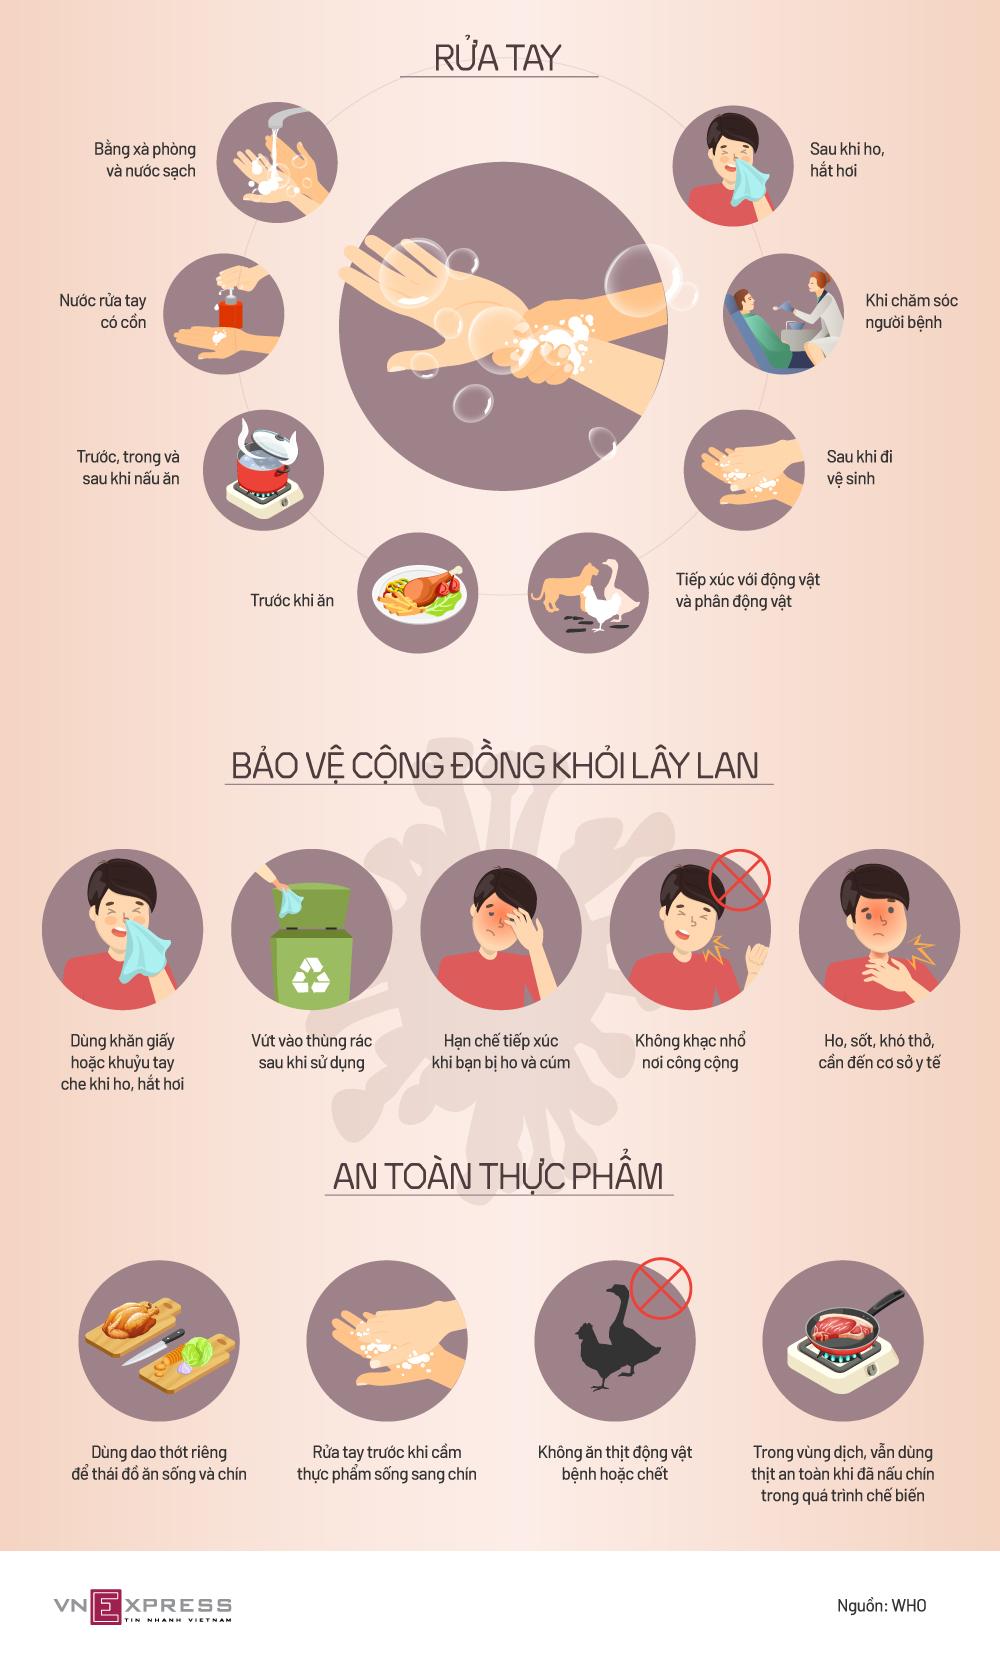 Khuyến cáo virut Corona